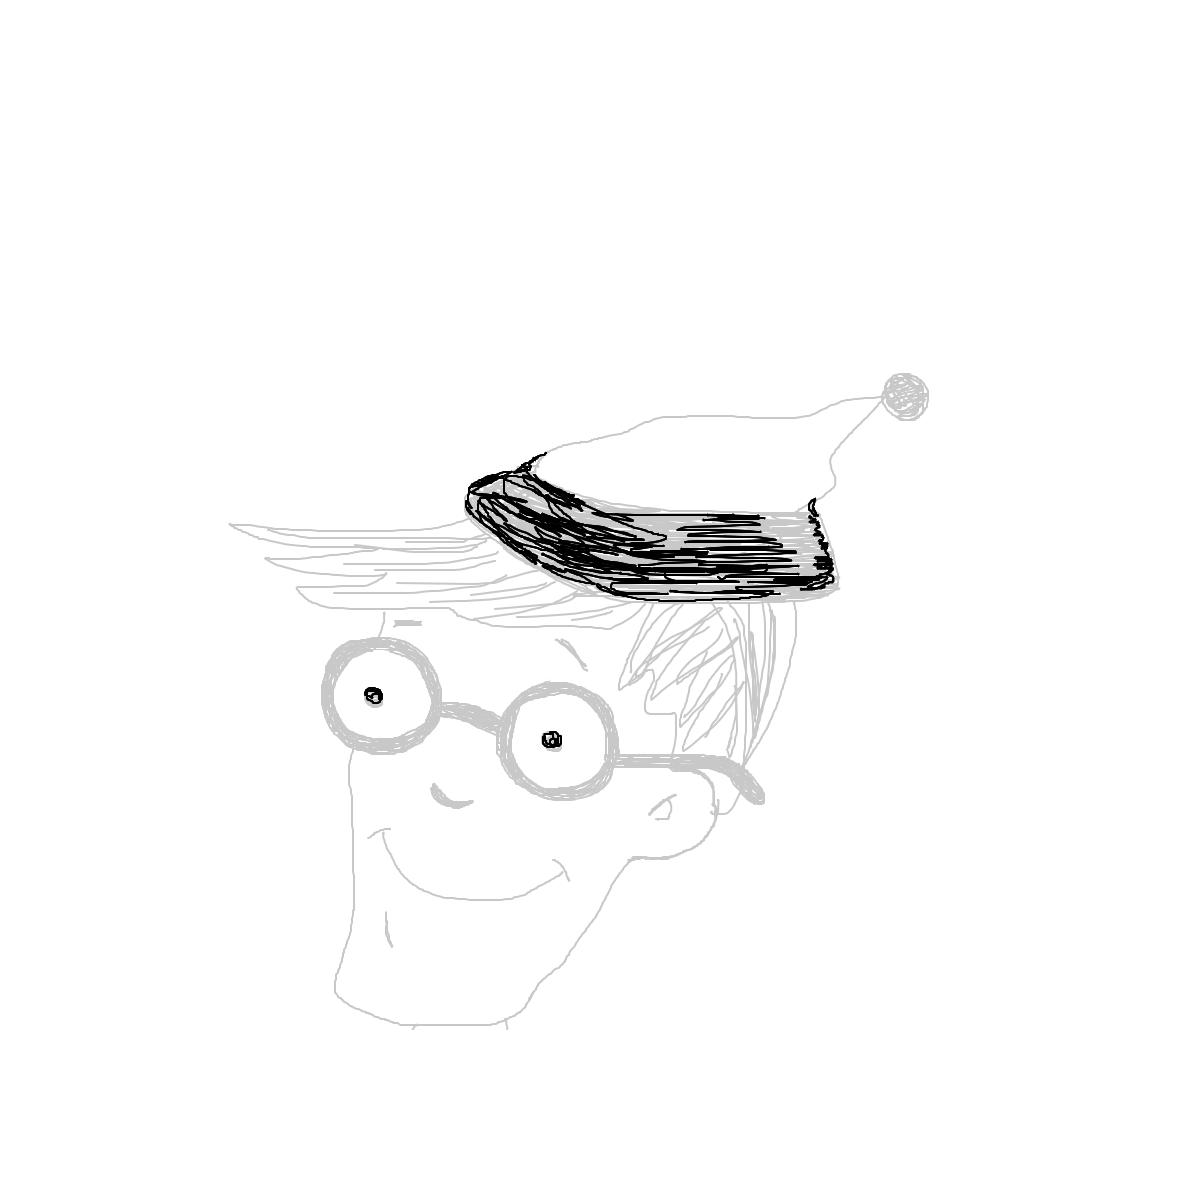 BAAAM drawing#5847 lat:41.6676826477050800lng: -0.8849817514419556